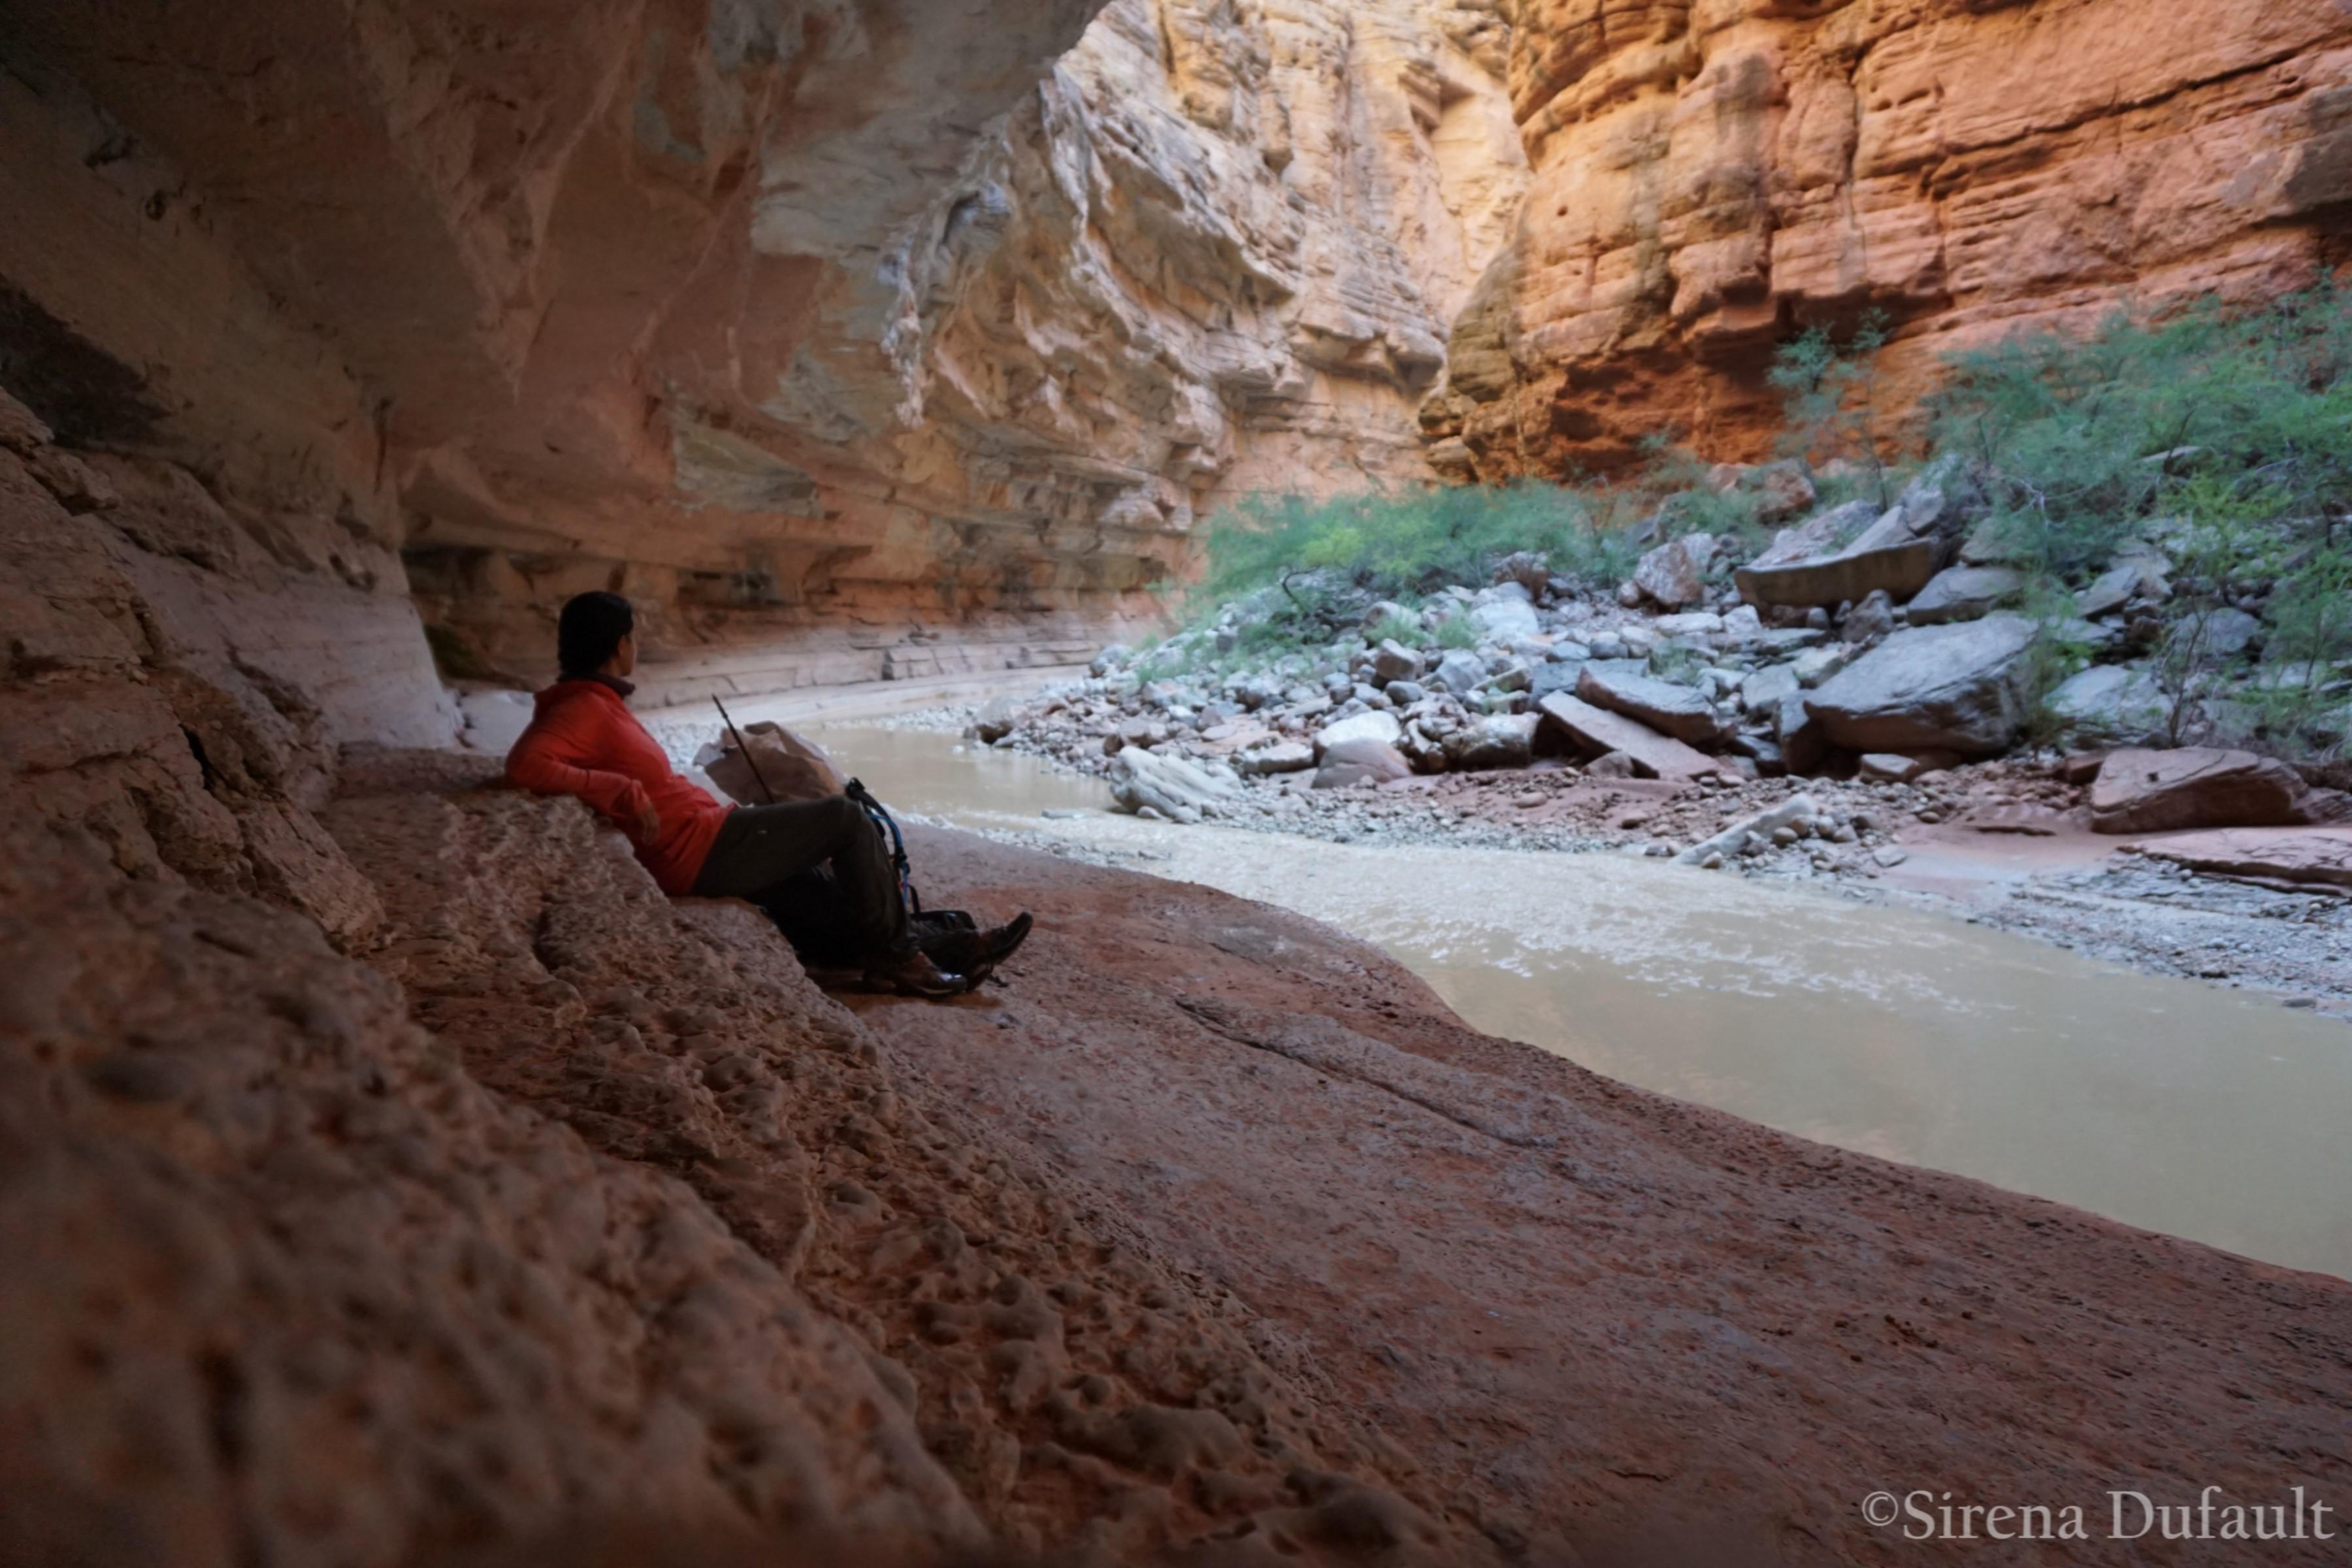 Relaxing on the Muav ledges in Kanab Creek